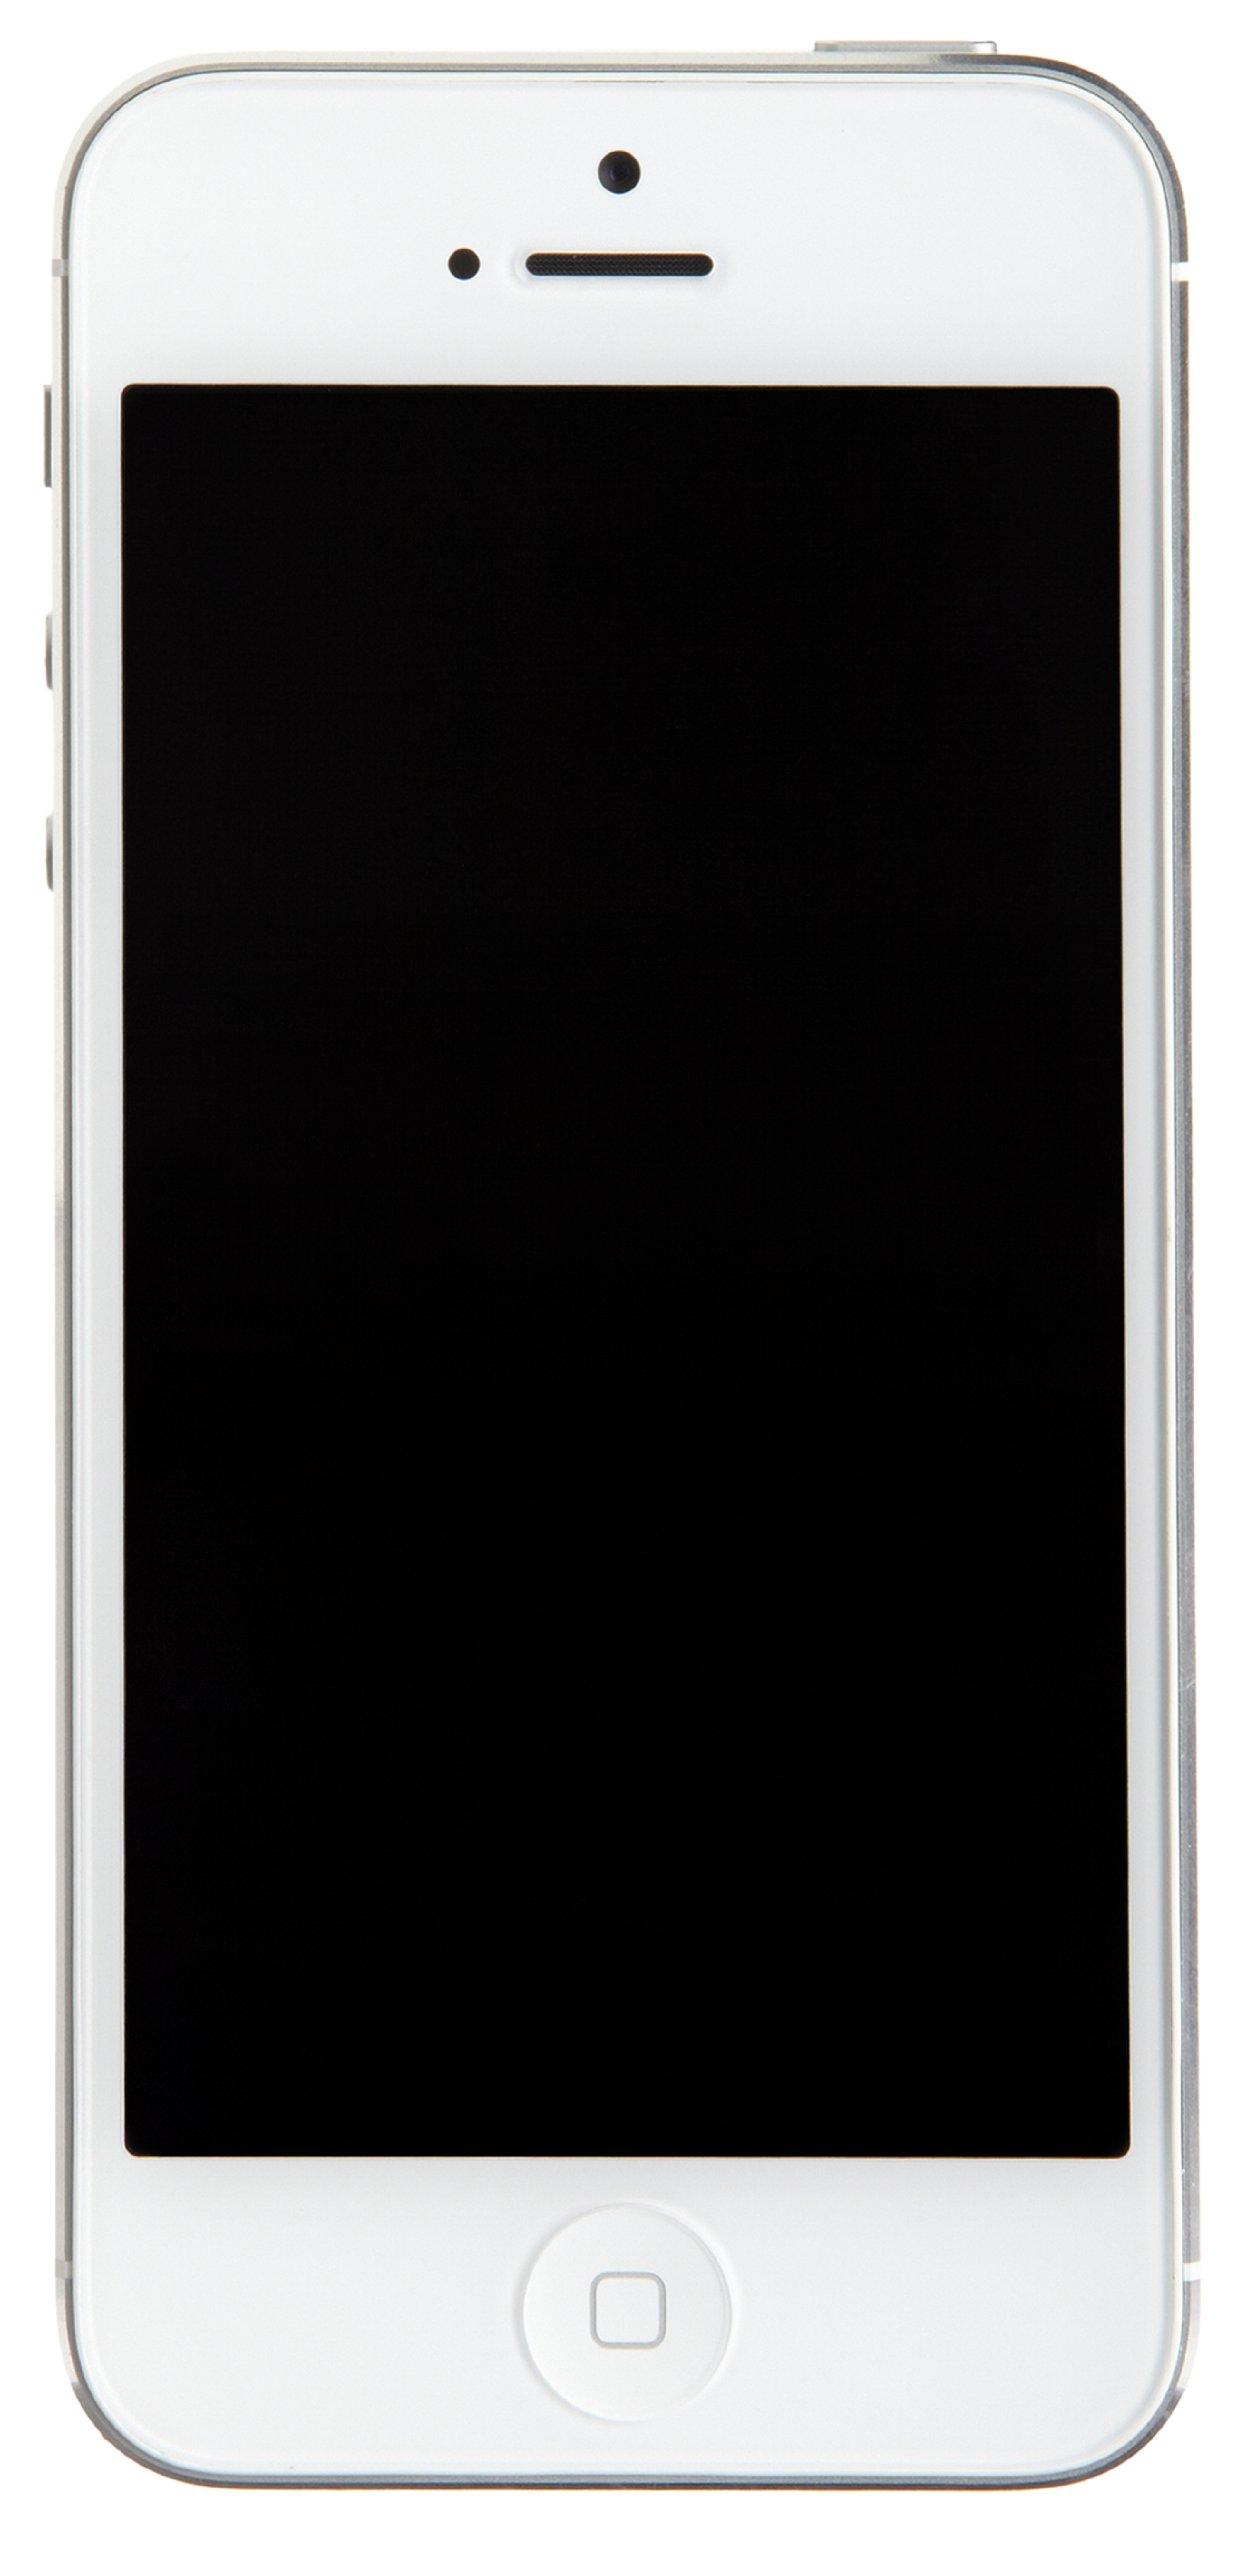 Apple iPhone 5 16 GB Unlocked, White